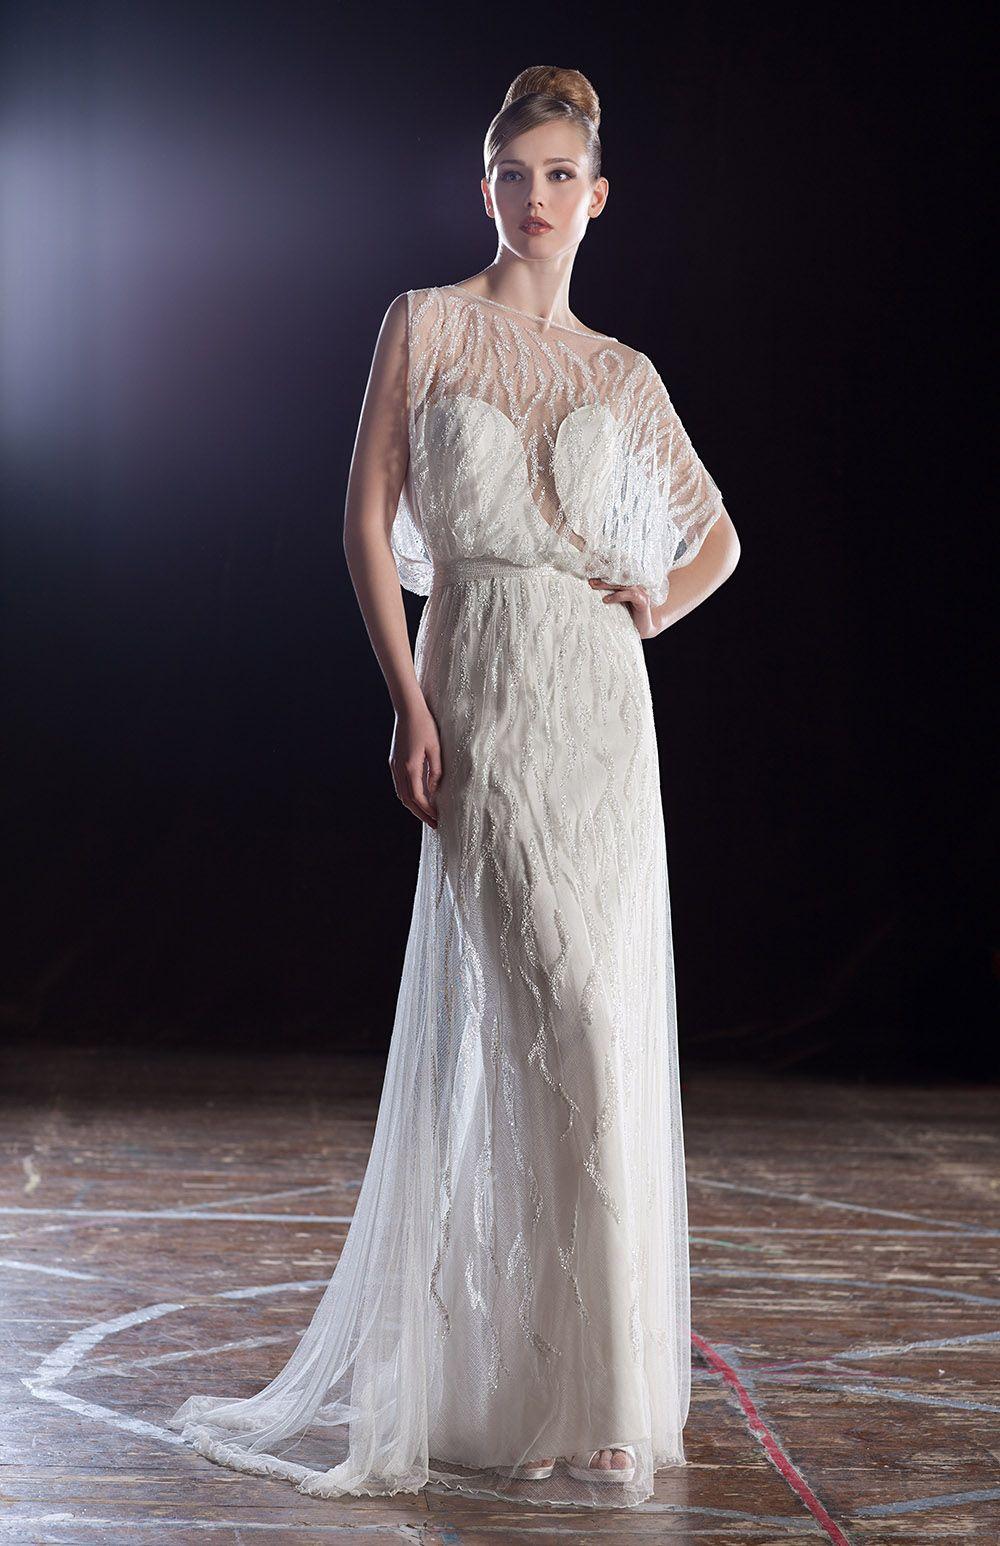 Glamourous Da AltamurabariWinter Abiti Sposa Trilogy UGqMzLSVp